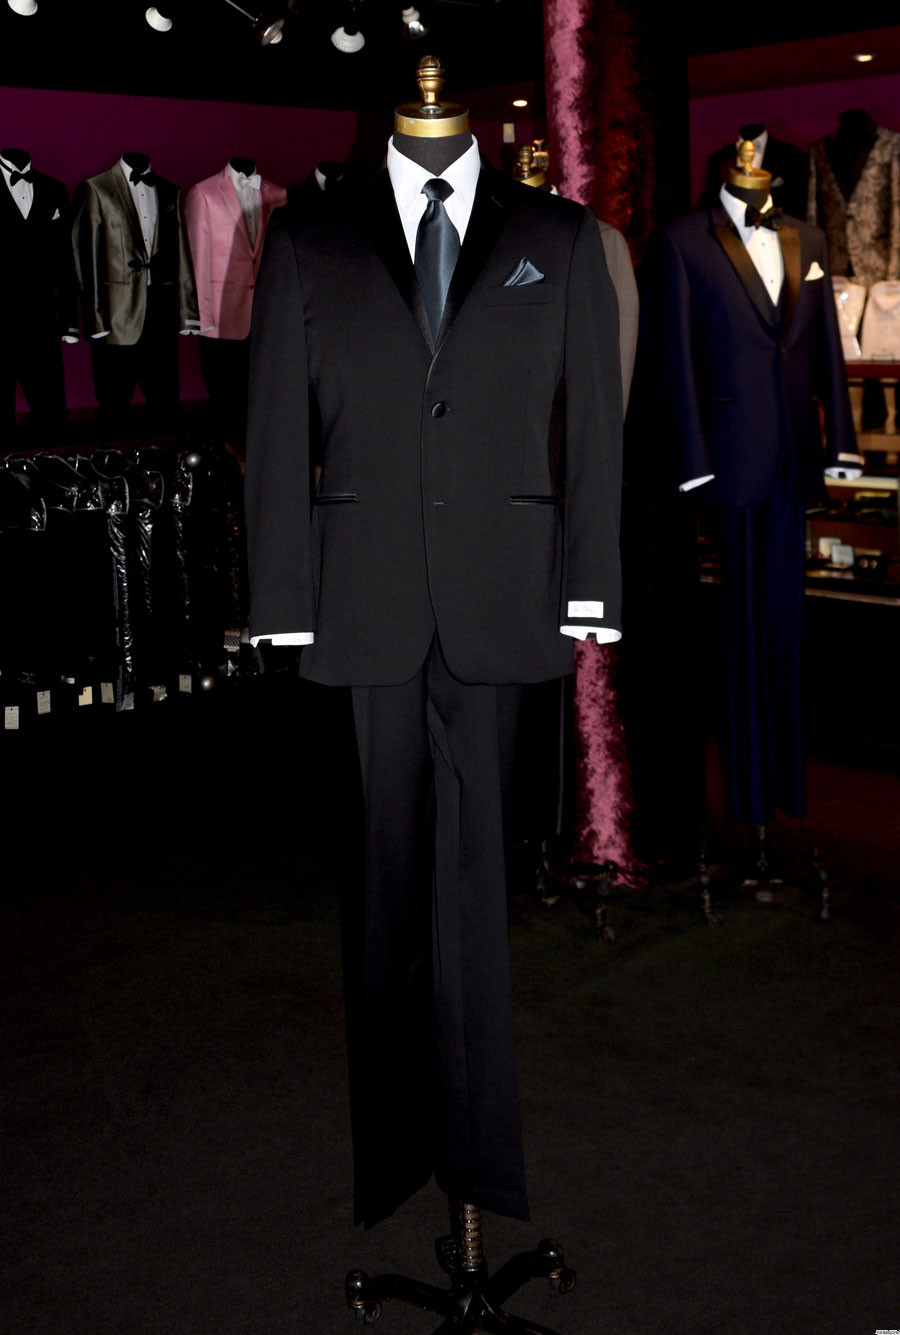 men's charcoal long tie and black tuxedo at Tuxbling.com